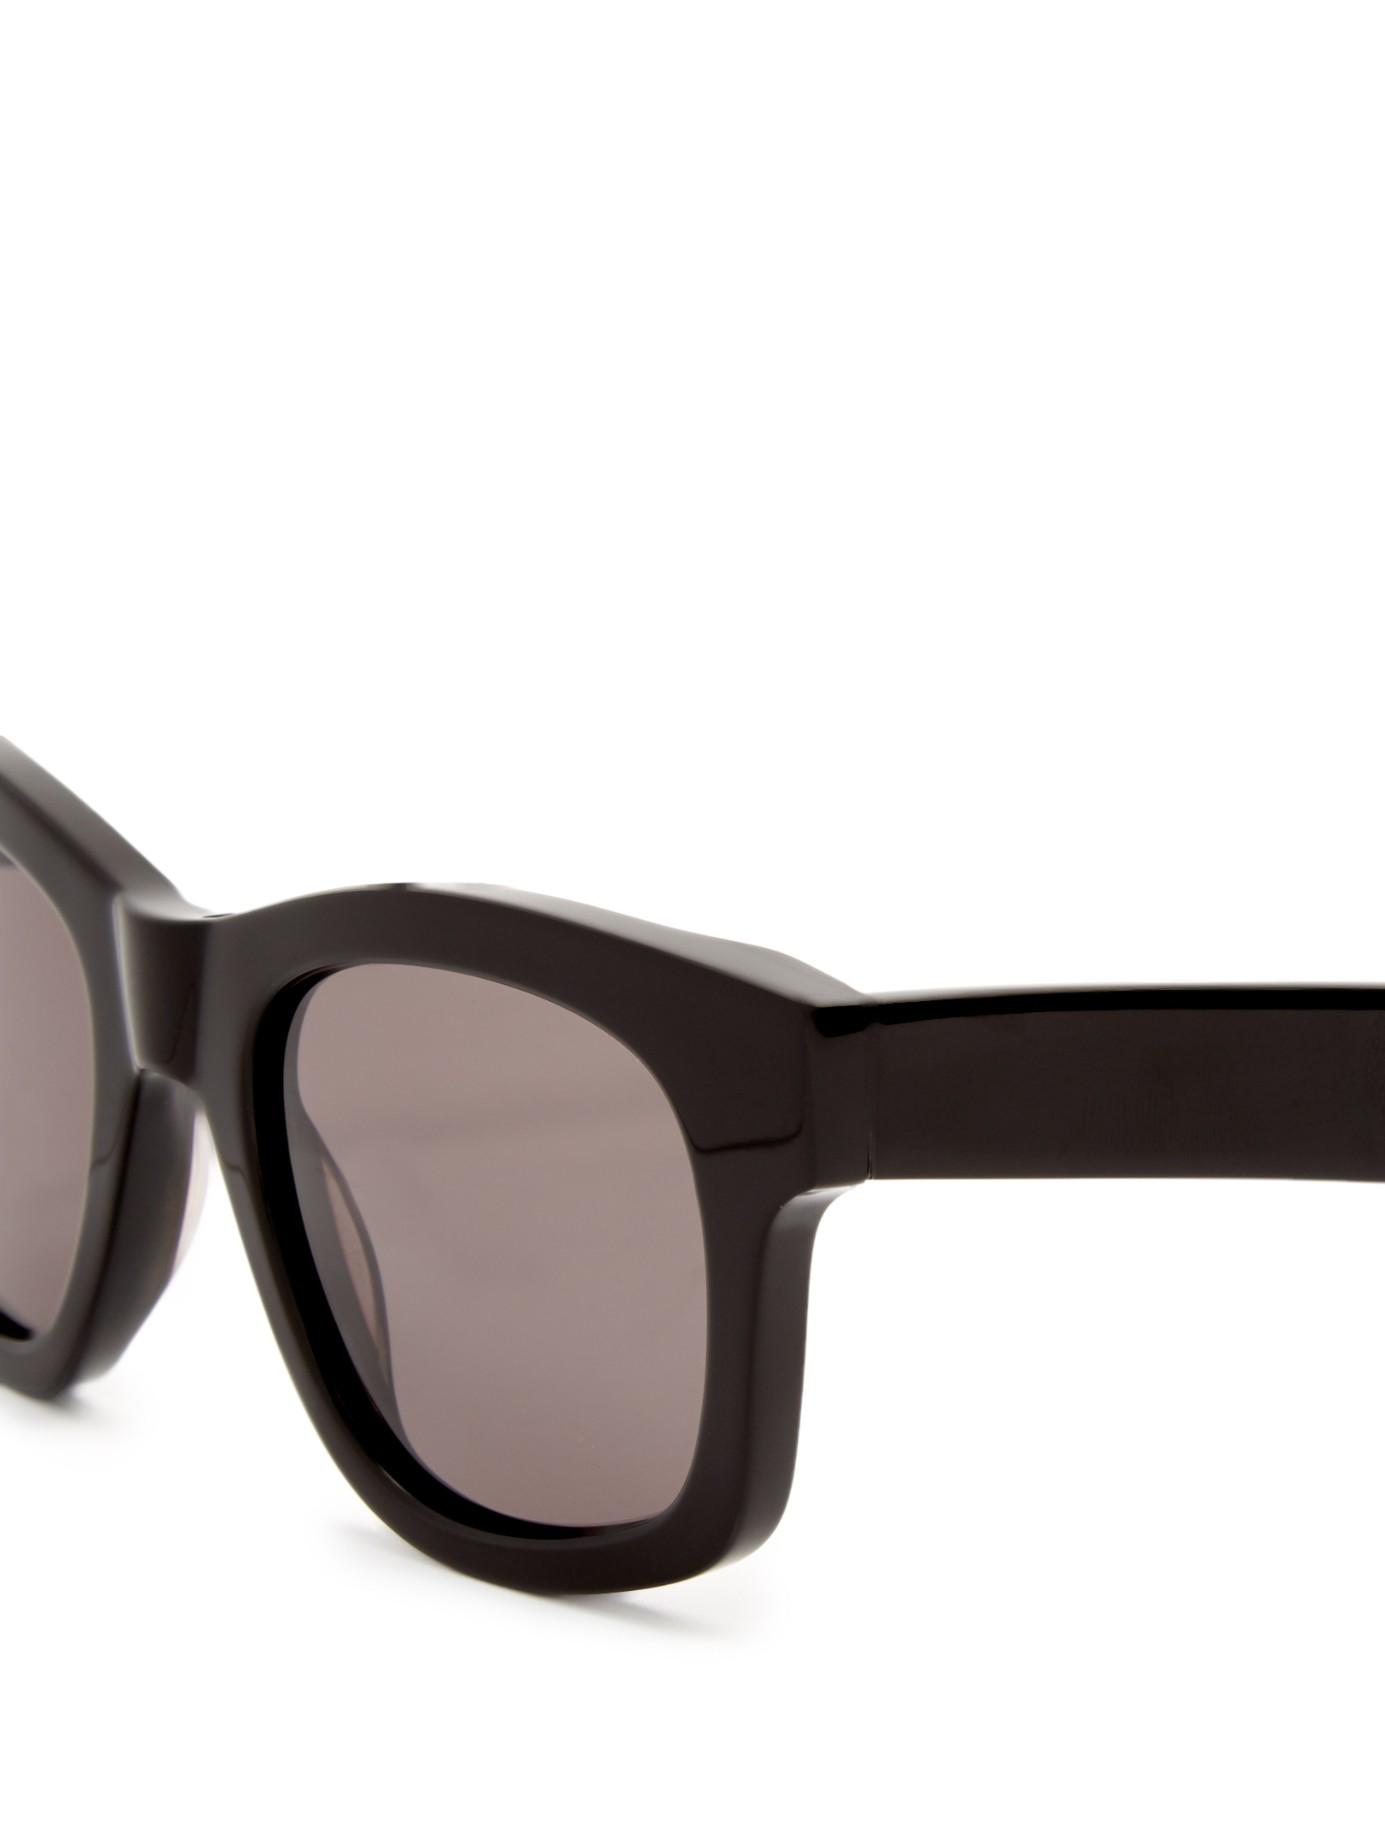 Sun Buddies Type 01 Bibi Sunglasses in Black for Men